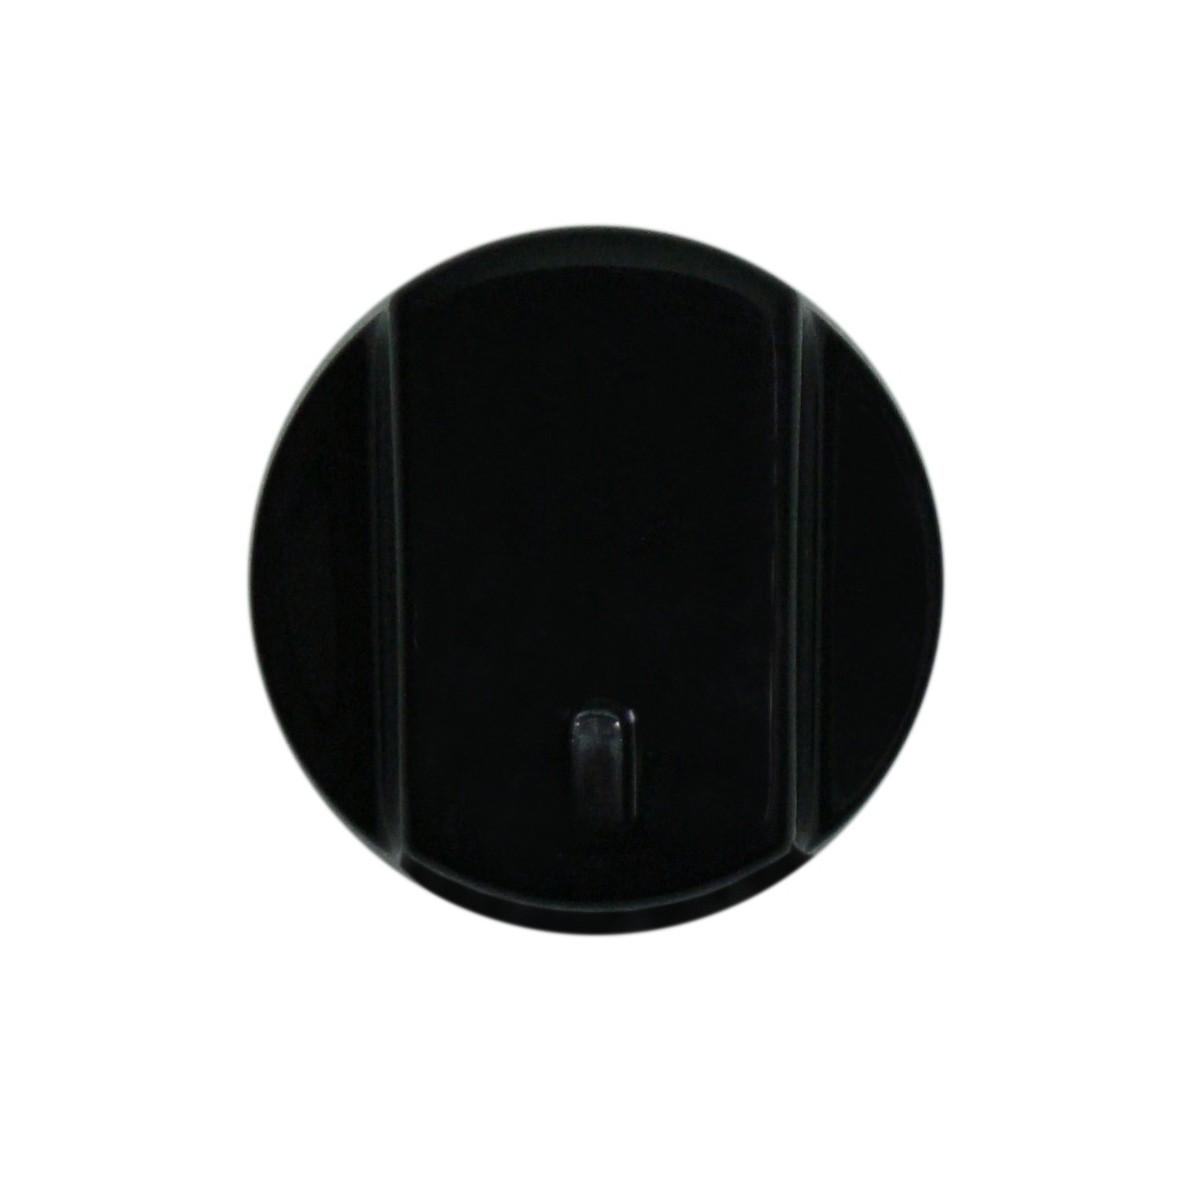 Manipulo Forno Do Fogão Electrolux - A99331702